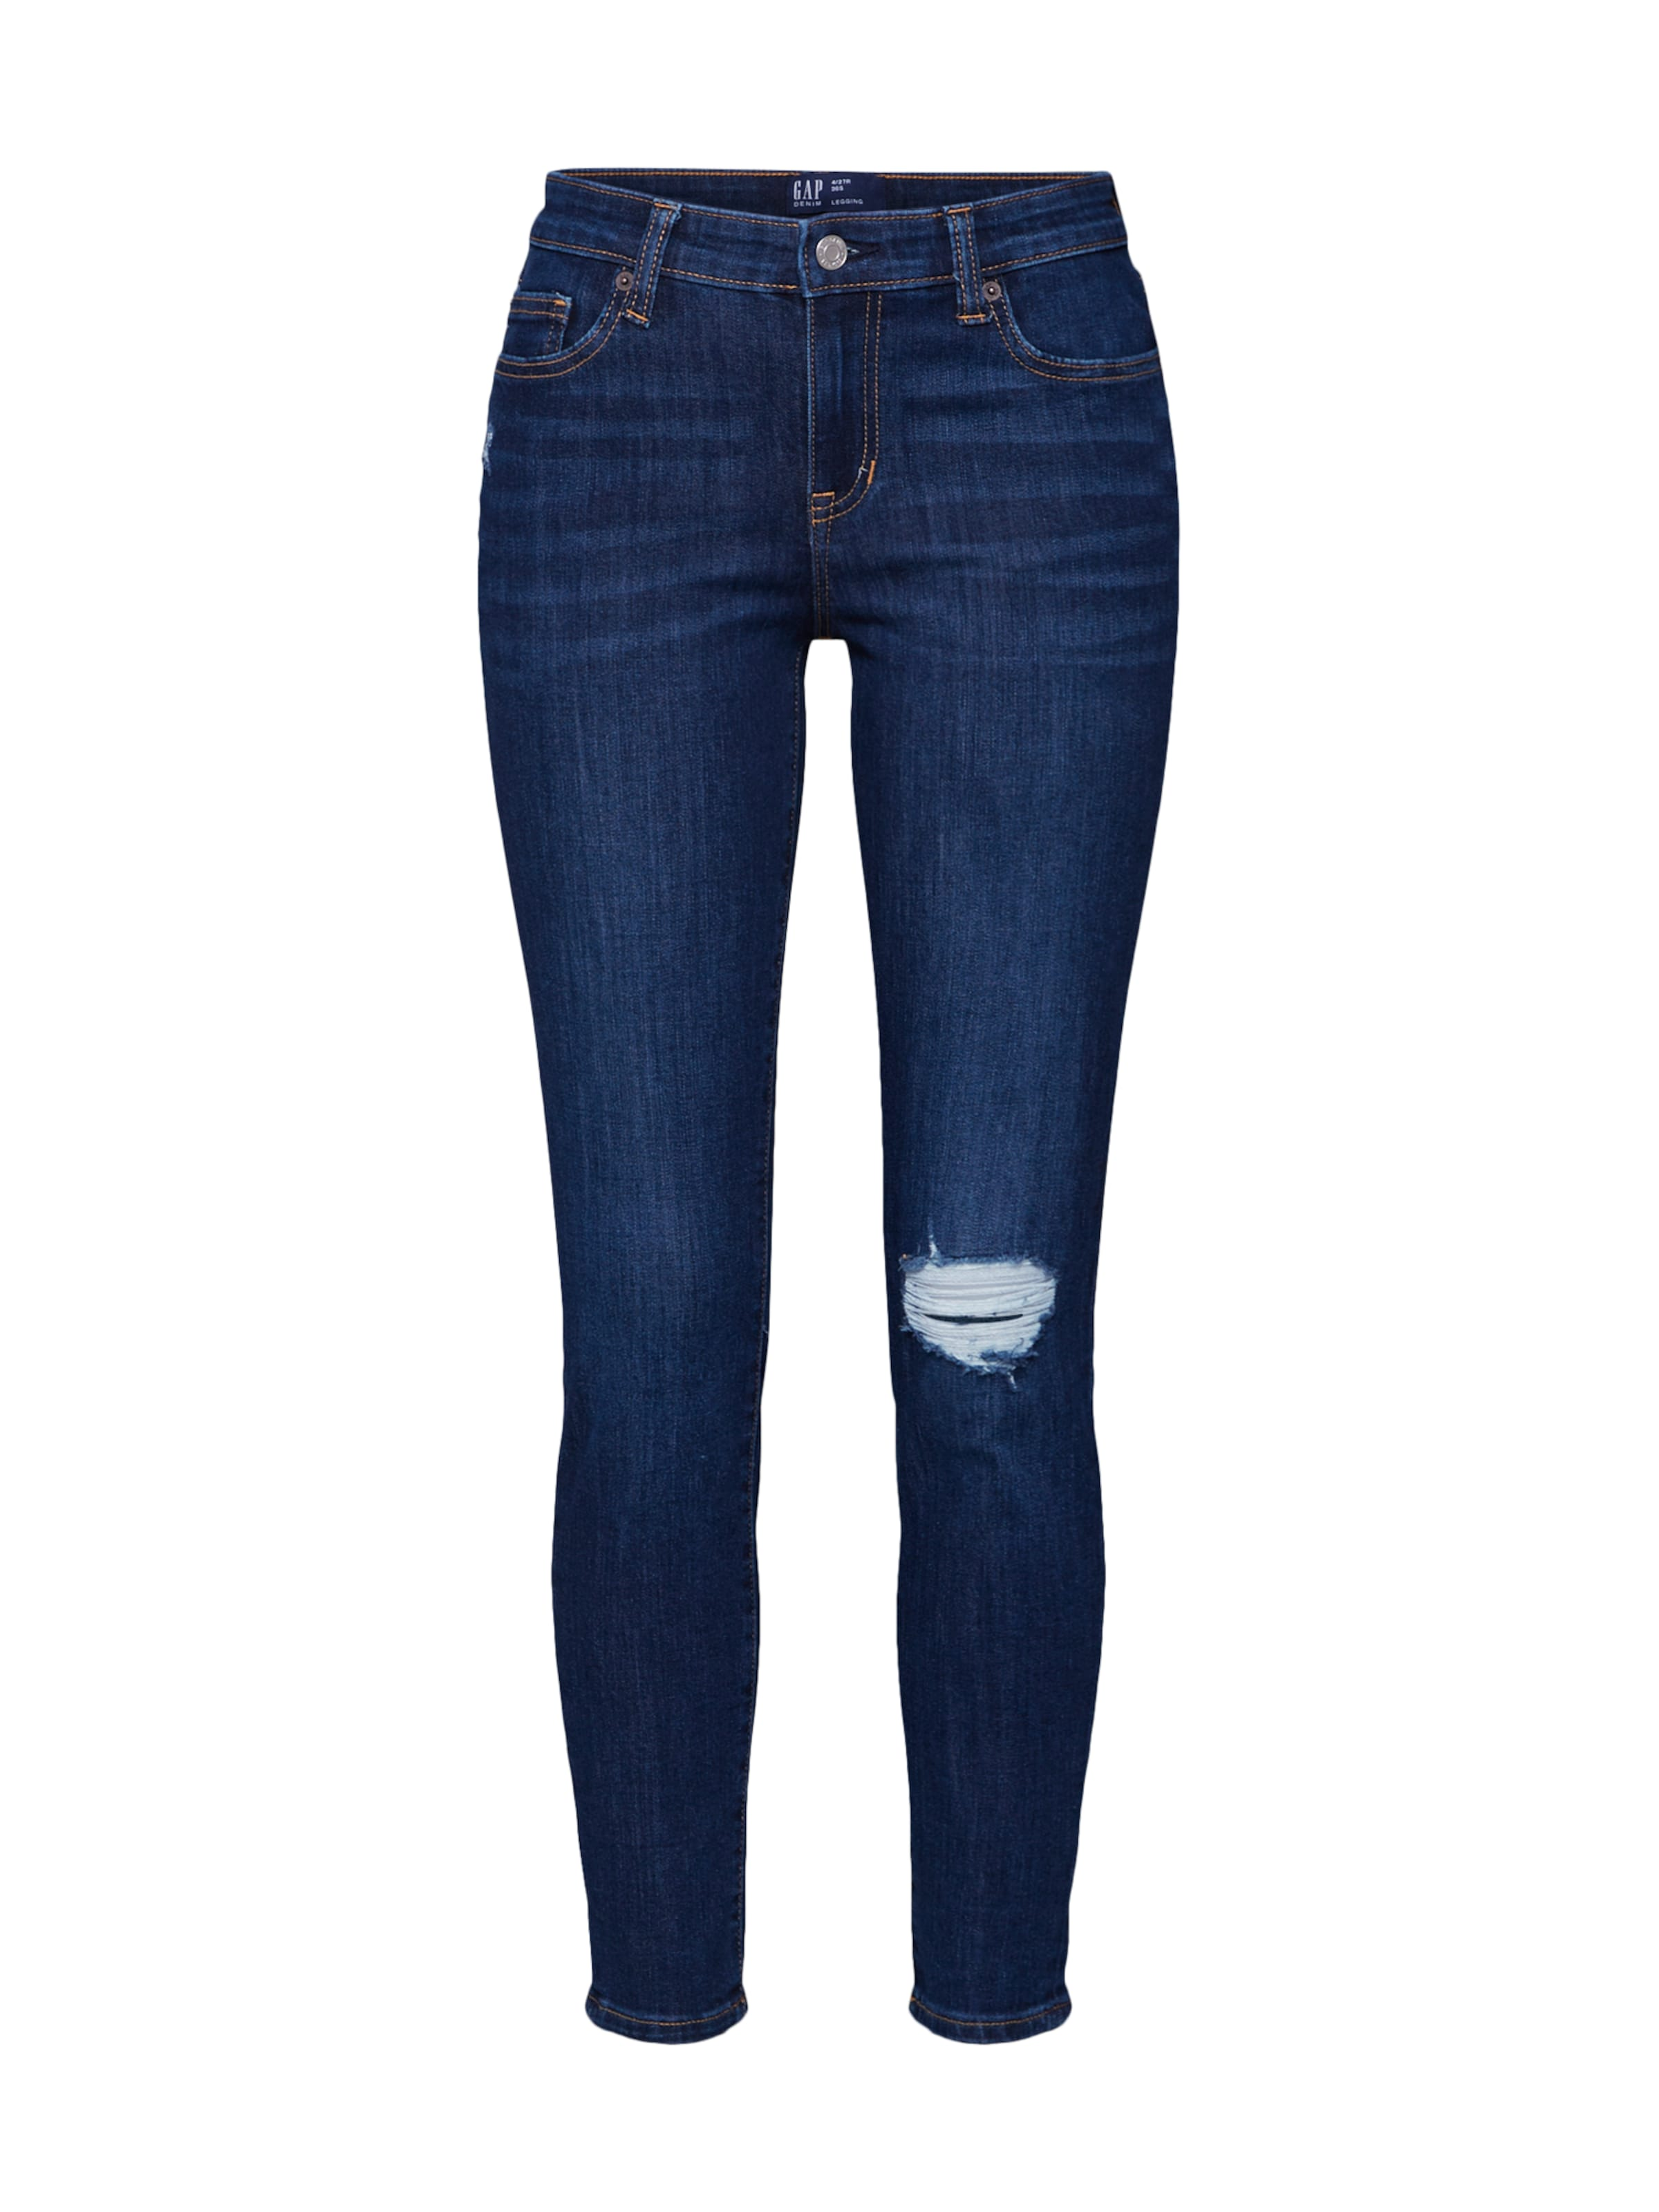 legging In Gap Kristin Jeans Dk Dest' 'v Indigo JcK1lF